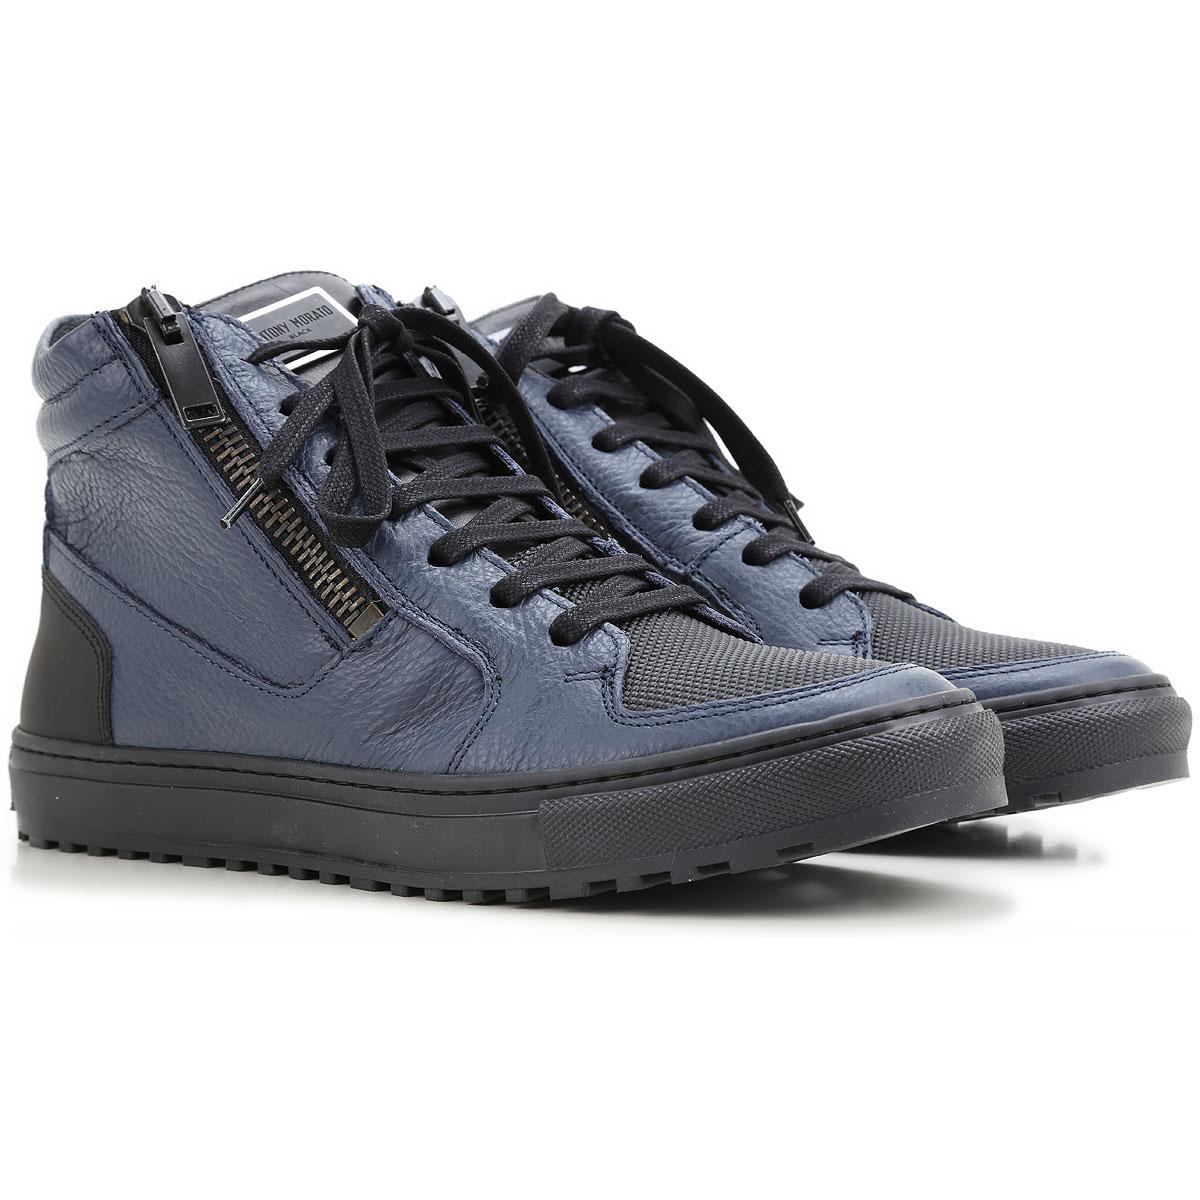 mens shoes antony morato style code fw00639 le300002 7044. Black Bedroom Furniture Sets. Home Design Ideas